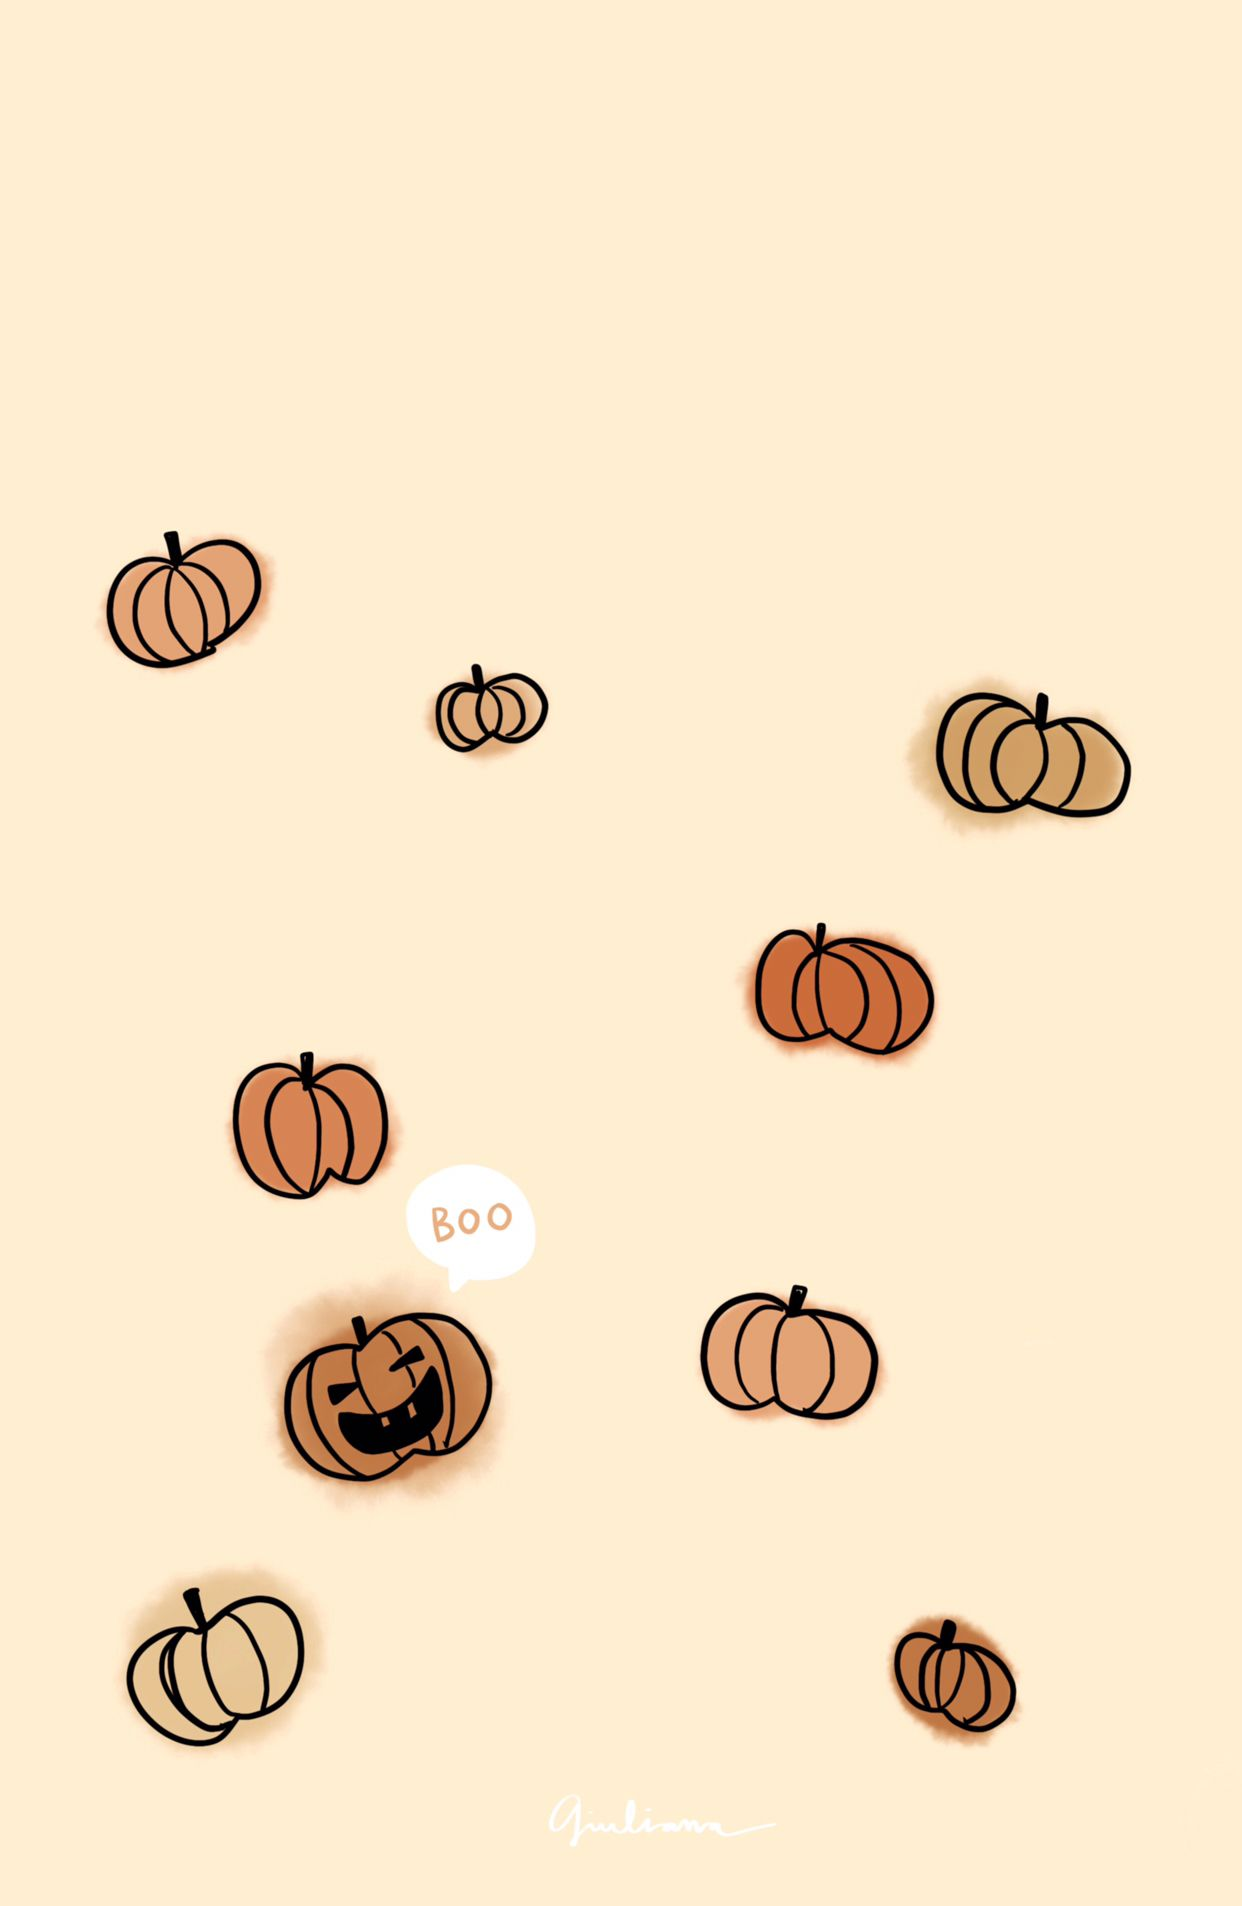 Fall Fallwallpaper Wallpaper Iphone Candles Illustrations